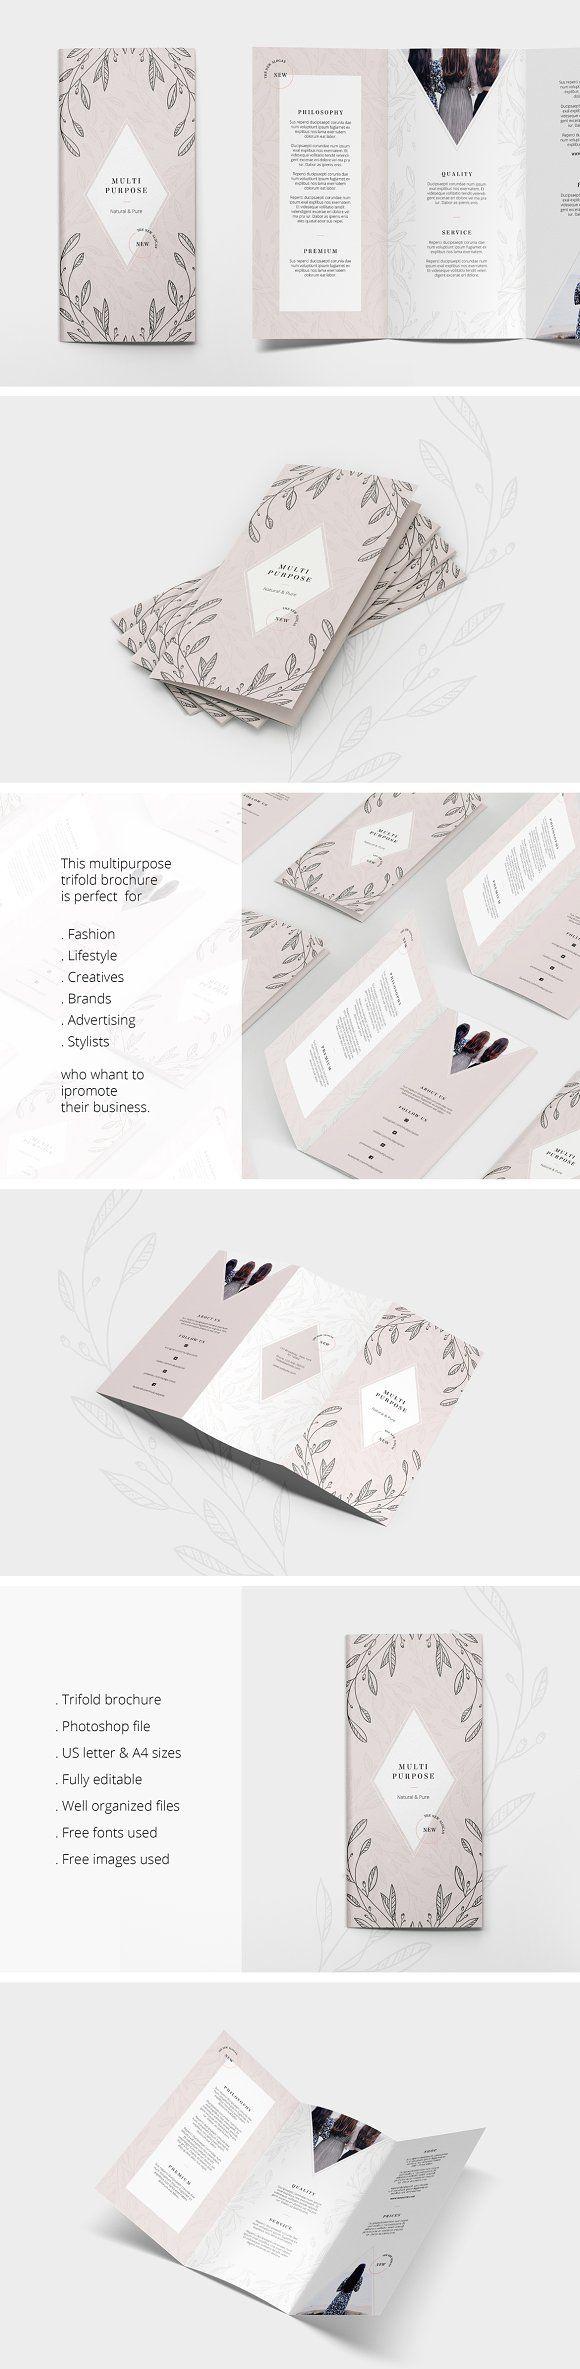 Multipurpose Trifold Flyer by AgataCreate on @creativemarket